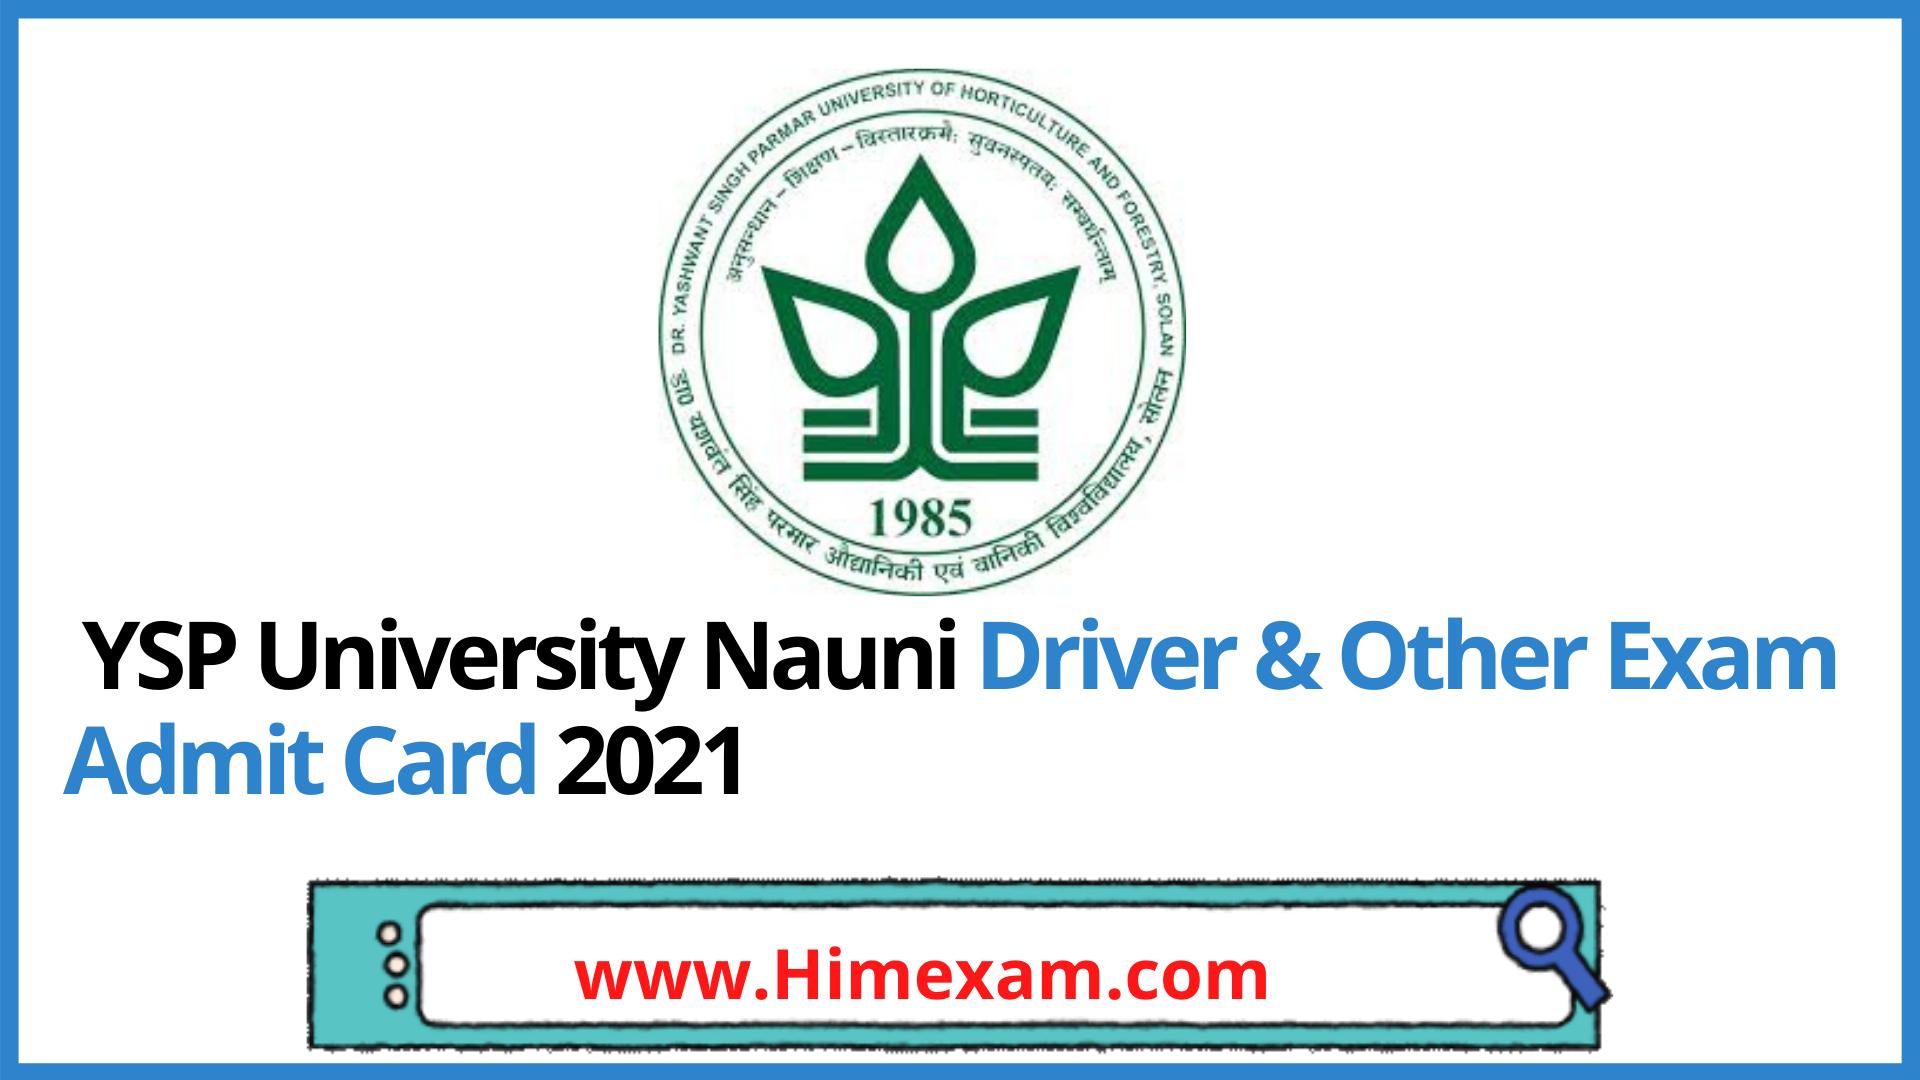 YSP University Nauni Driver & Other Exam Admit Card 2021